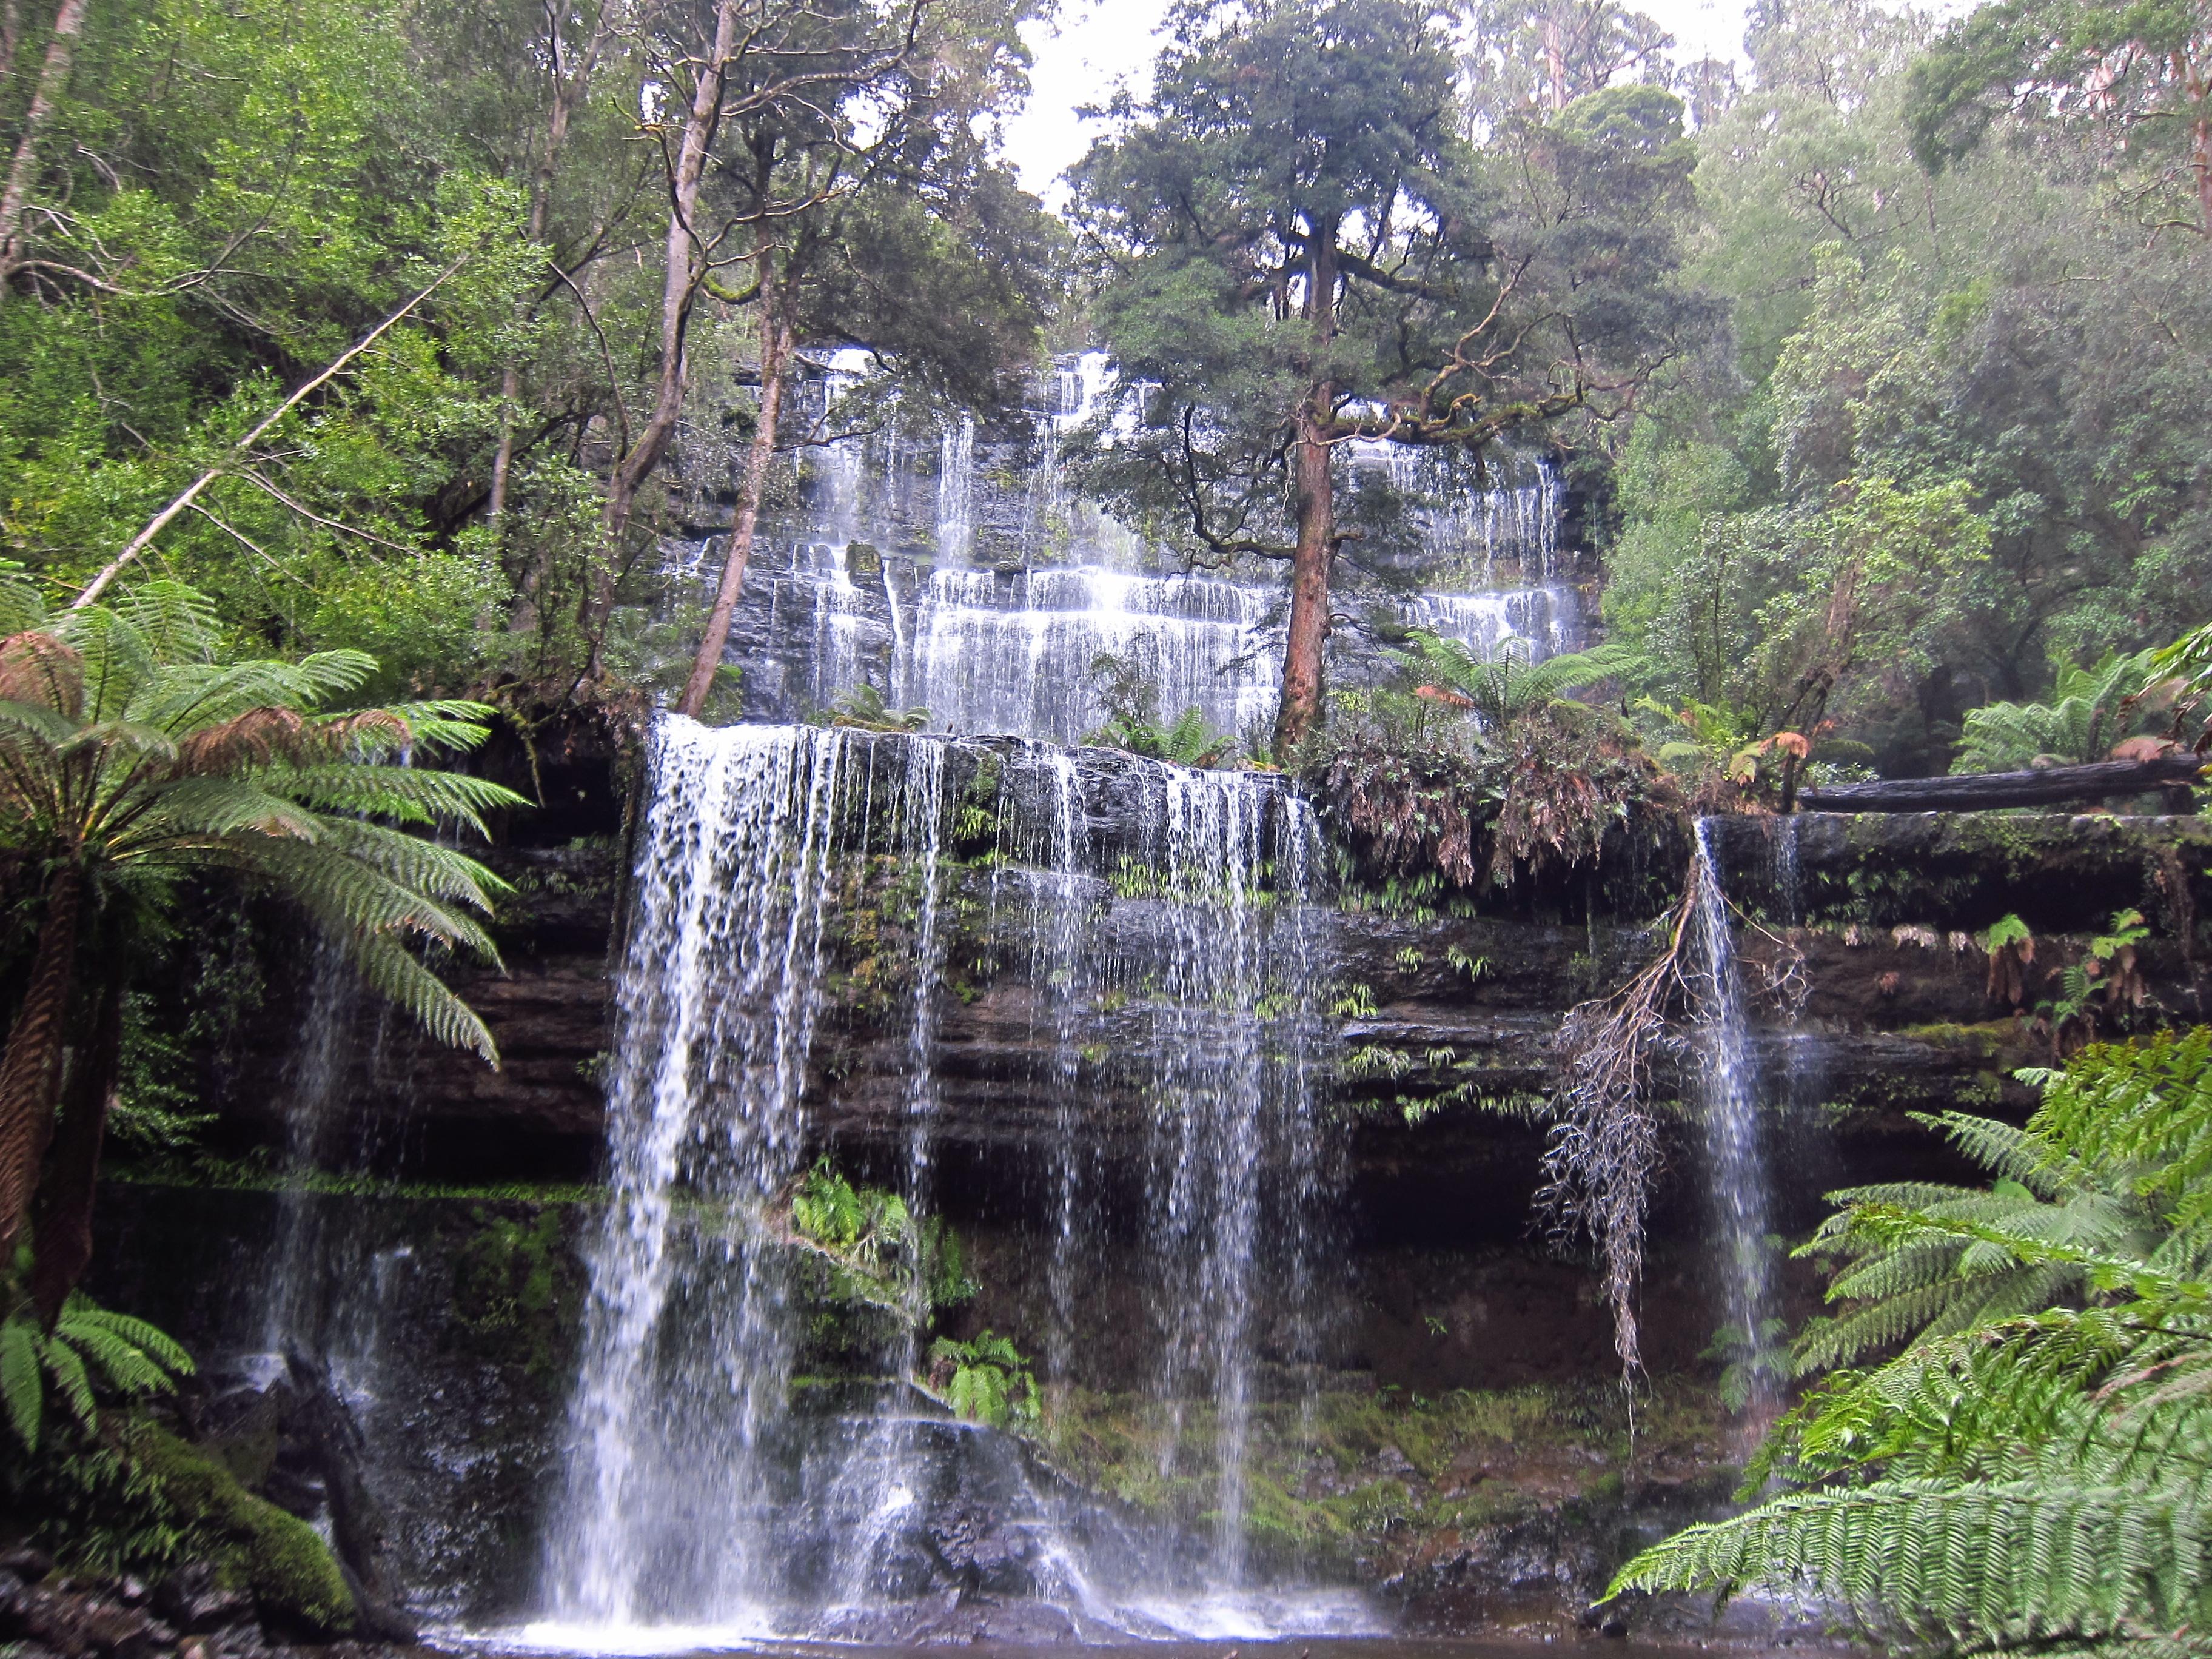 Cedric - Patissier en Australie - Mount Field National Park_